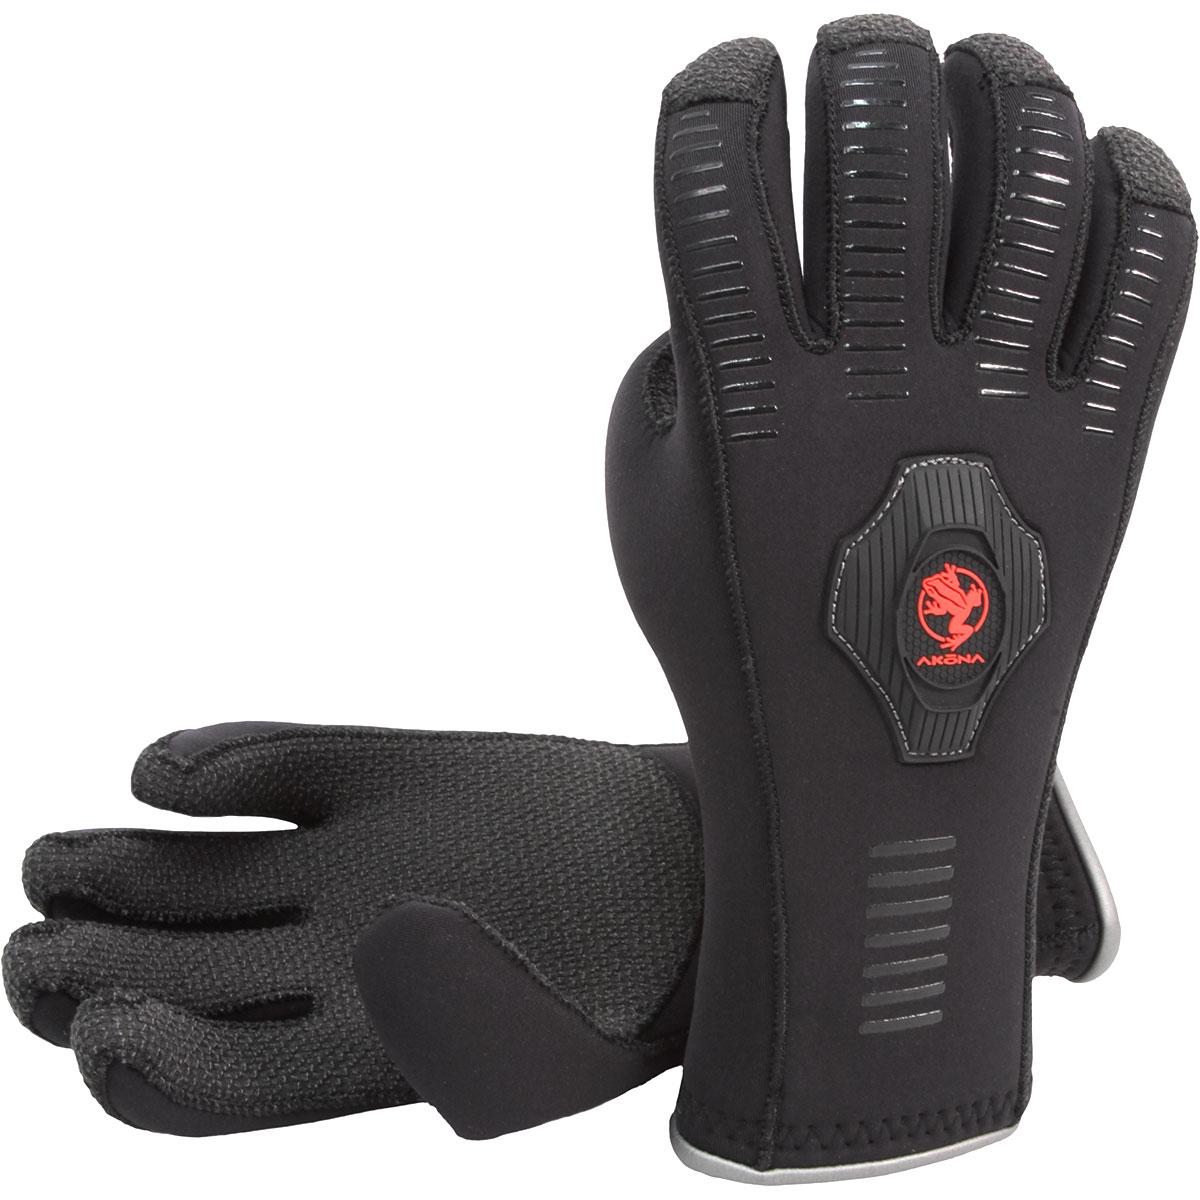 Akona 5mm Armor Tex Glove LG  AKNG156K